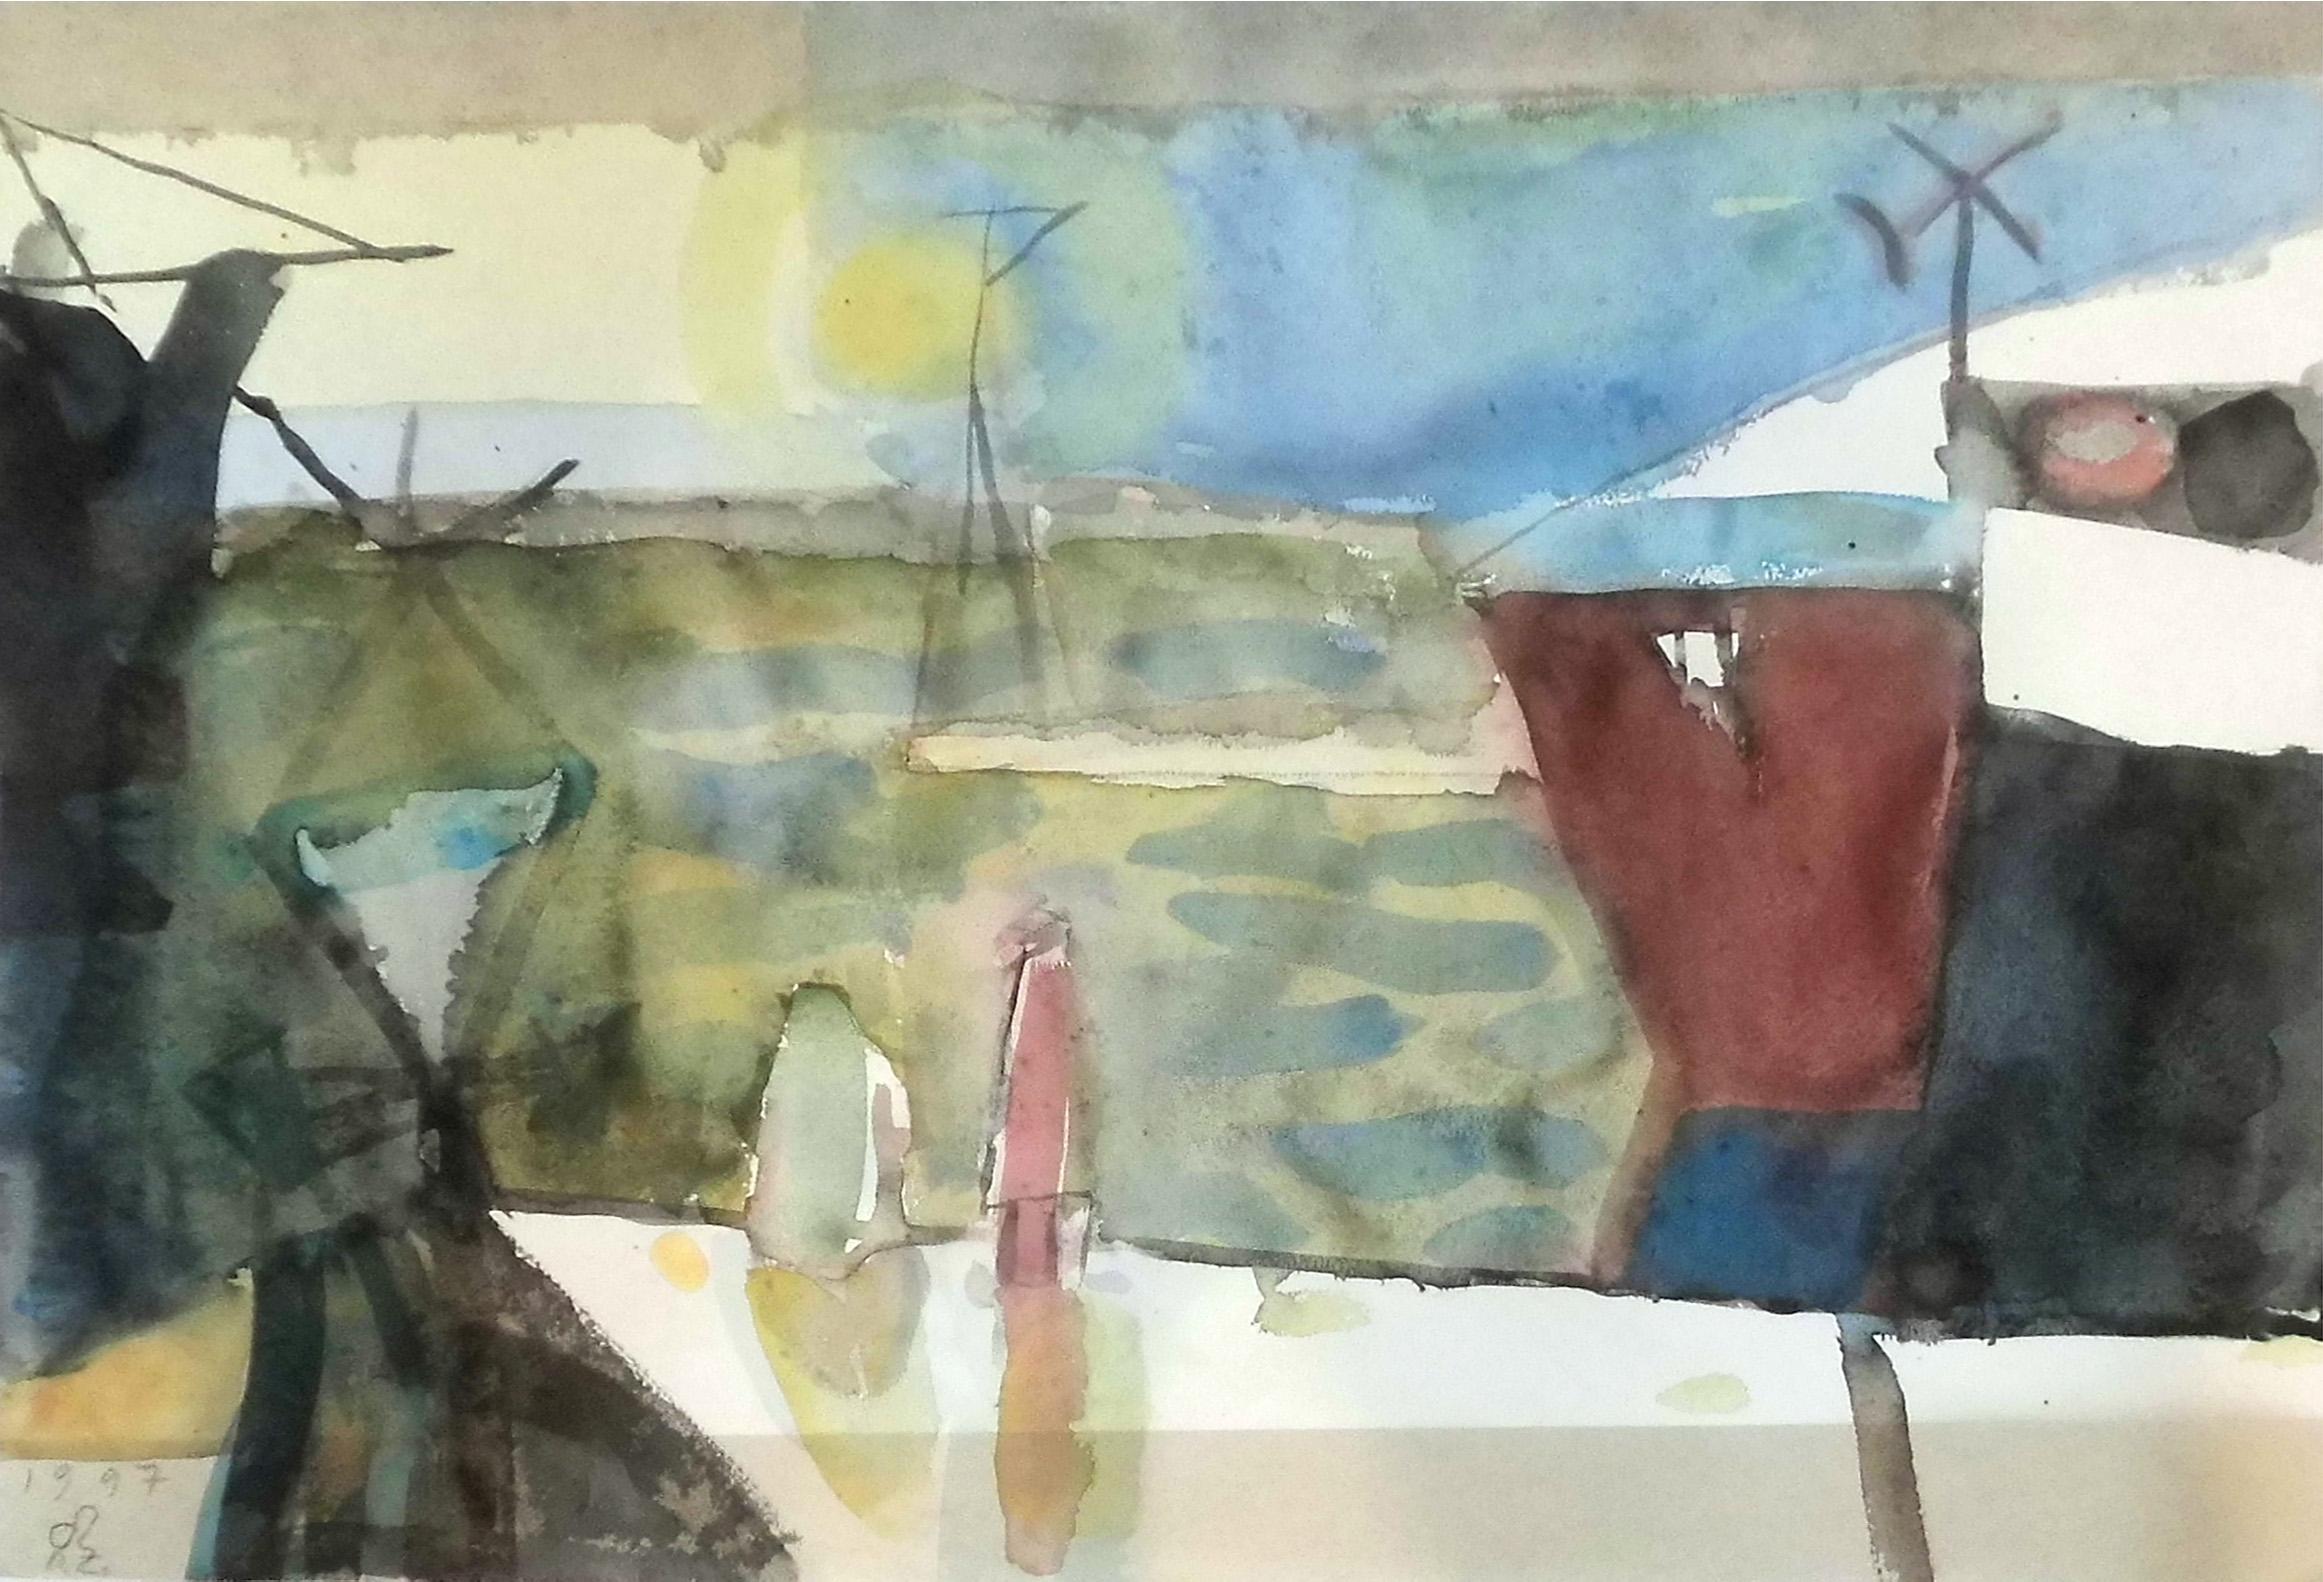 03-rainer_zille-ankunft_i-1997-aquarell-44x58-5